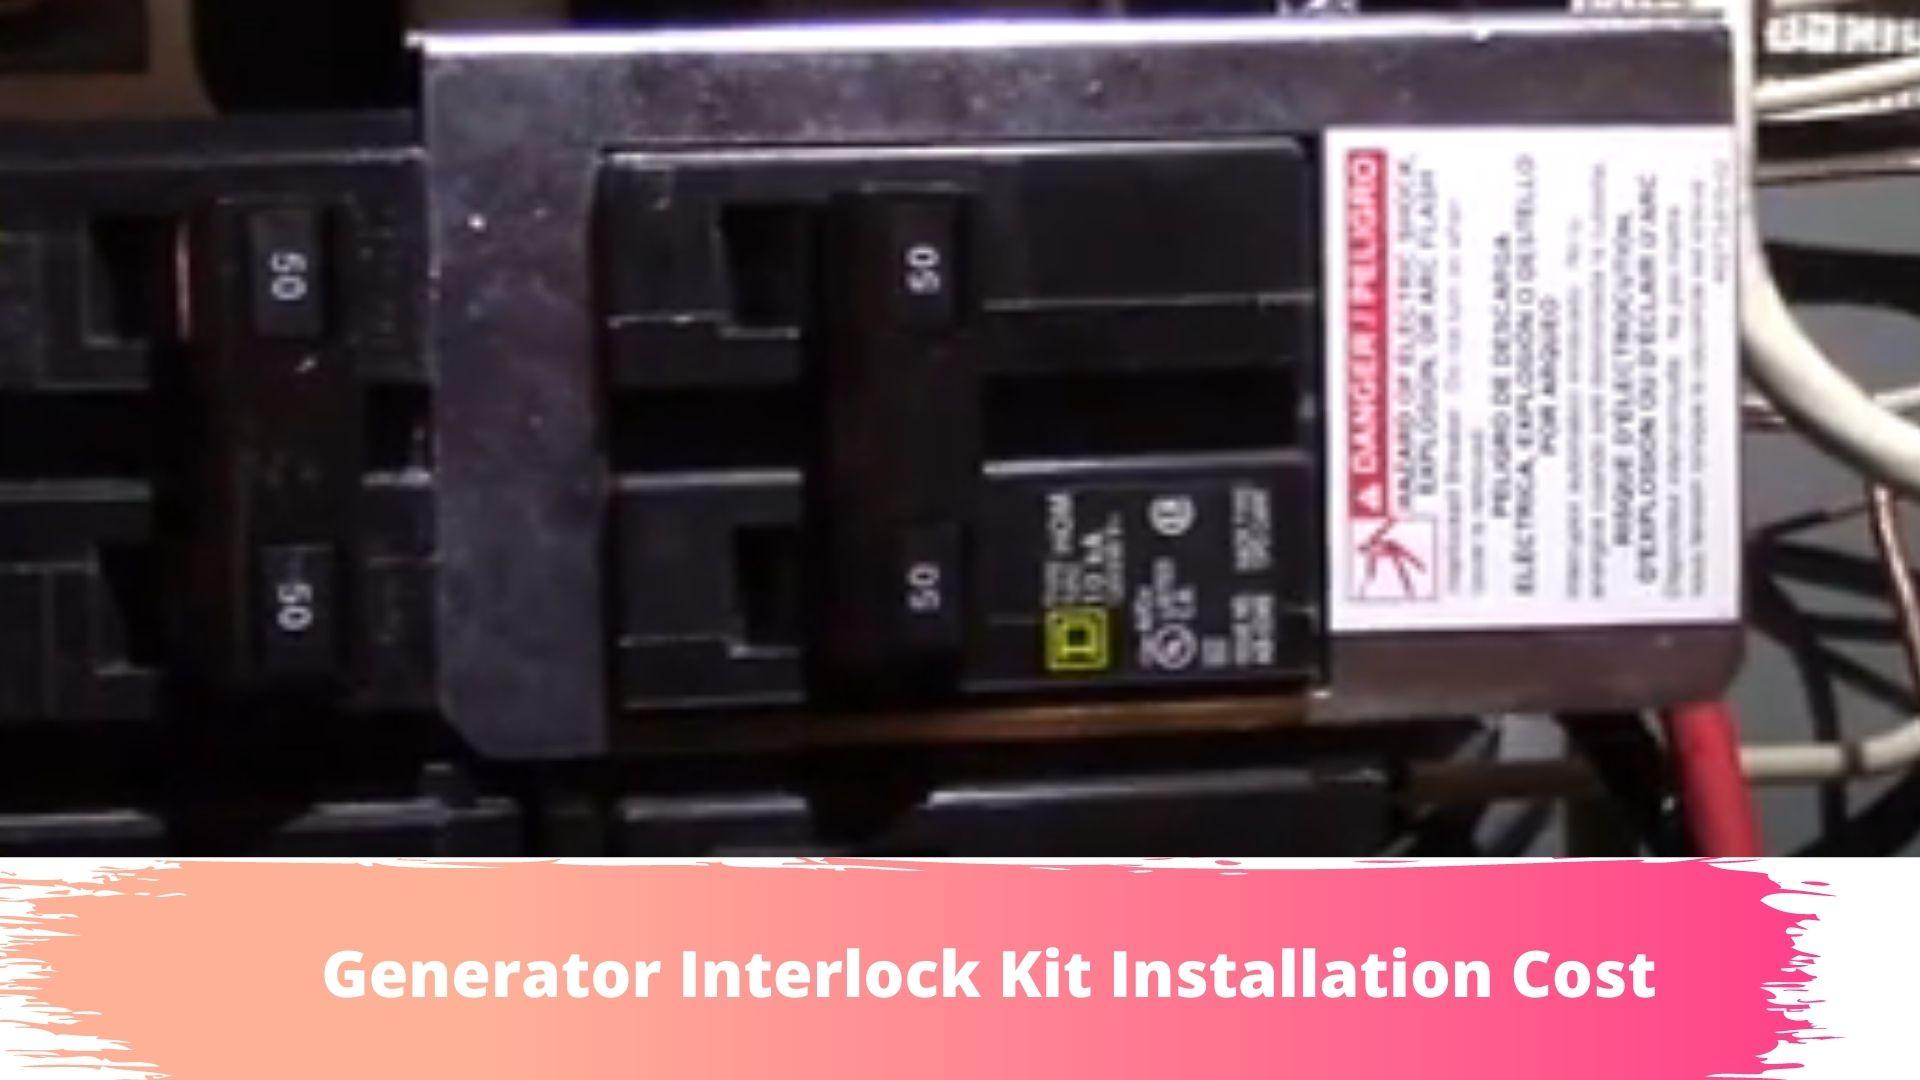 cost to install interlock kit